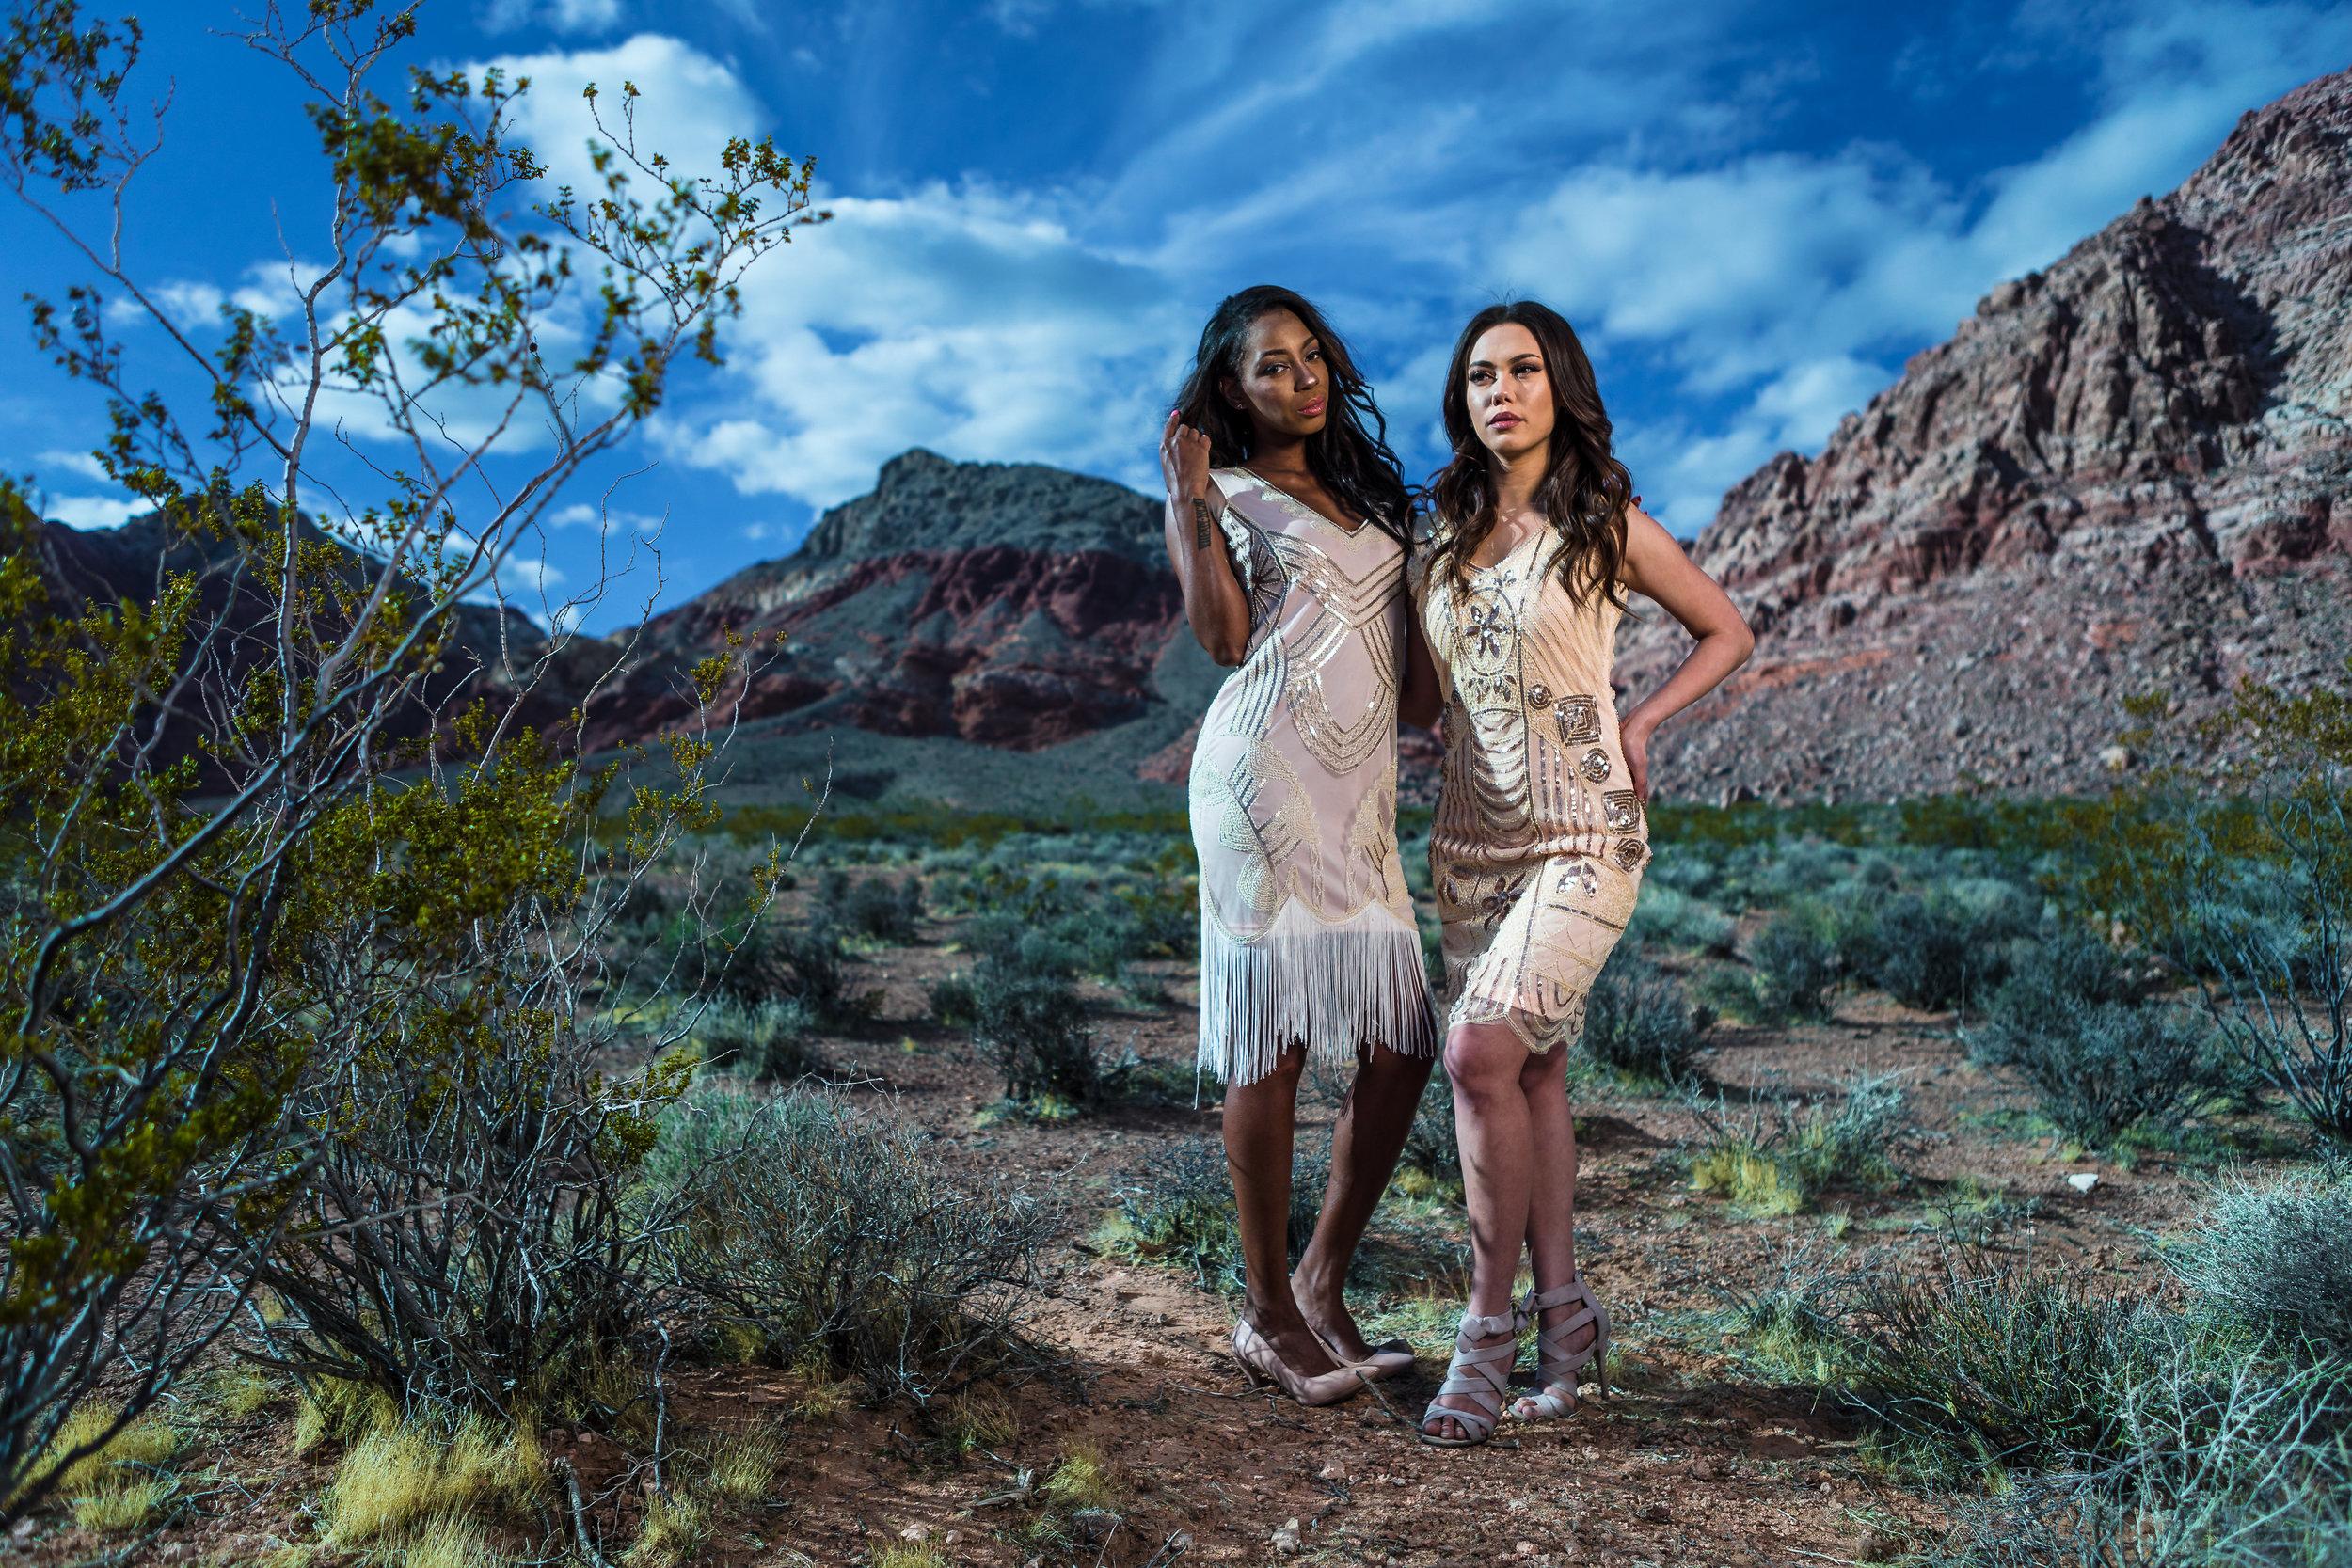 New_York_Photographer_Las_Vegas_Desert-132.jpg